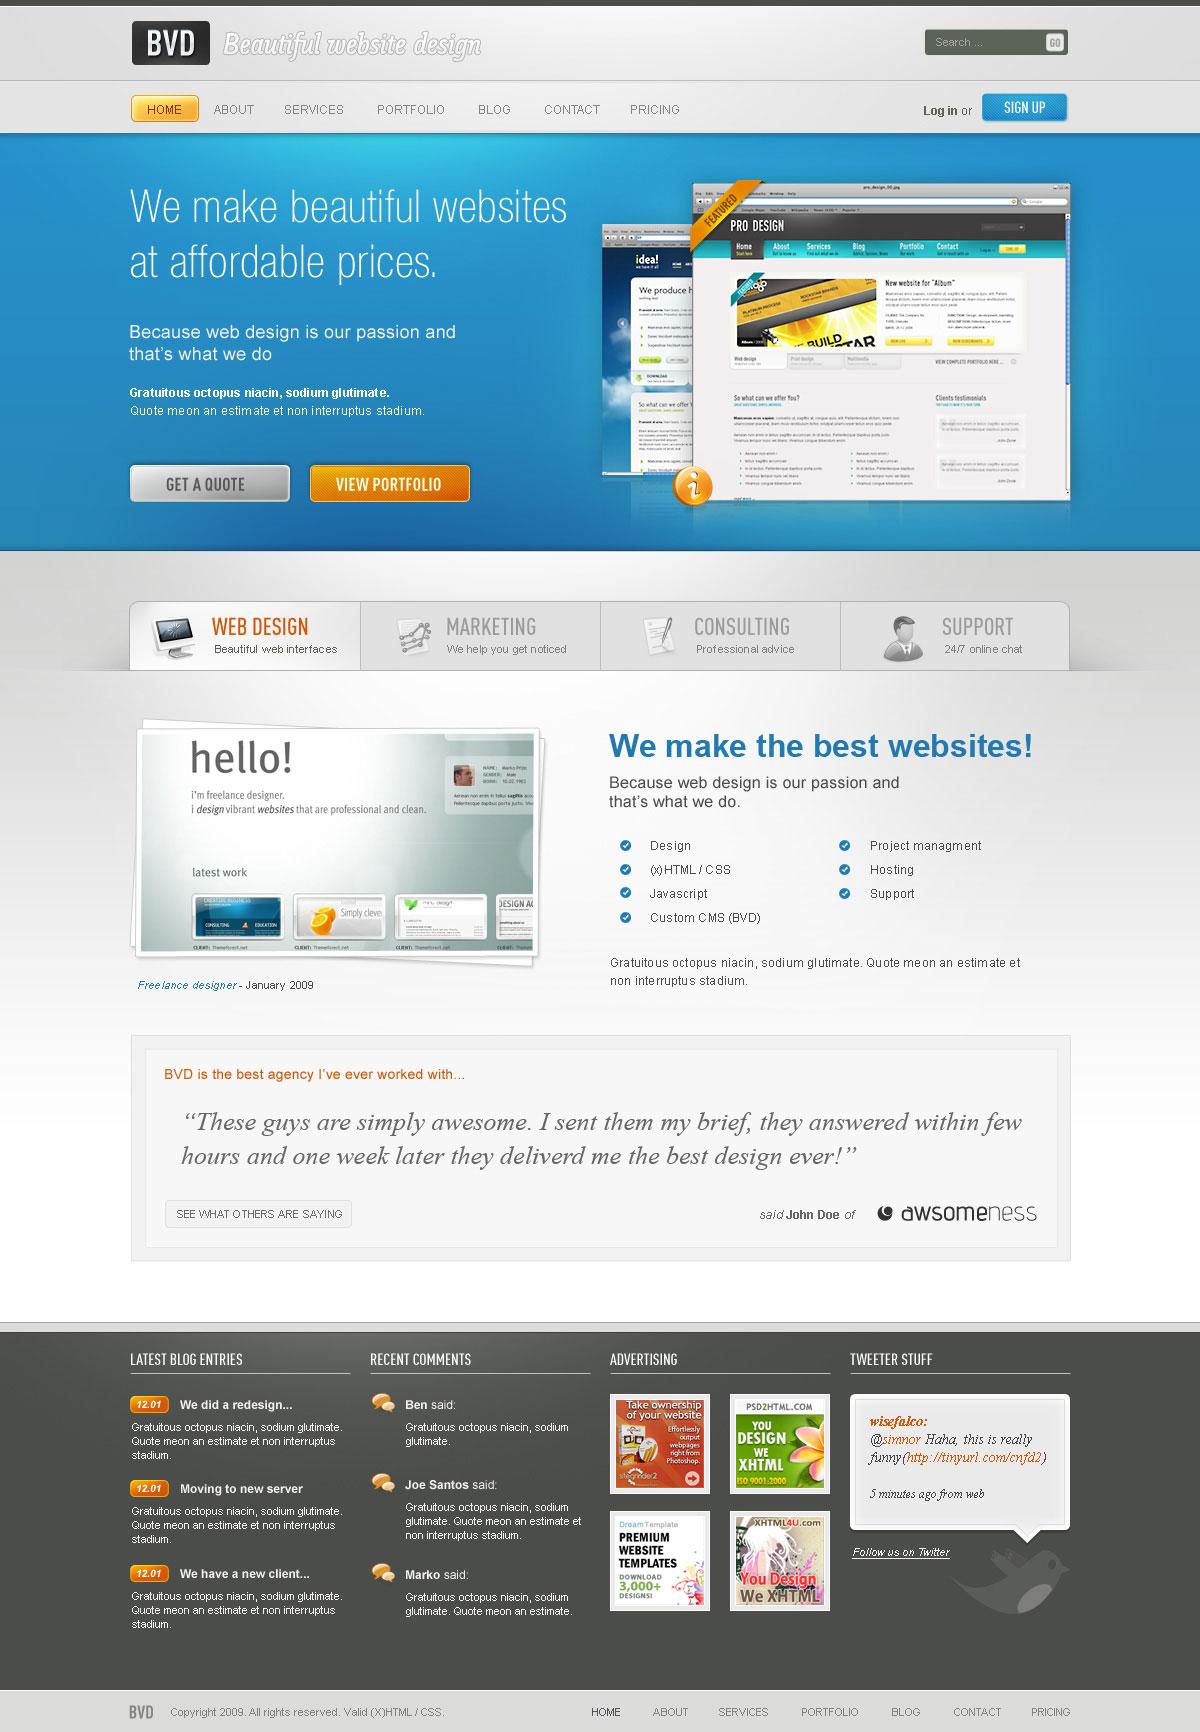 Bvd beautiful website design html by segen themeforest 136674screenshotsbvd00g accmission Image collections